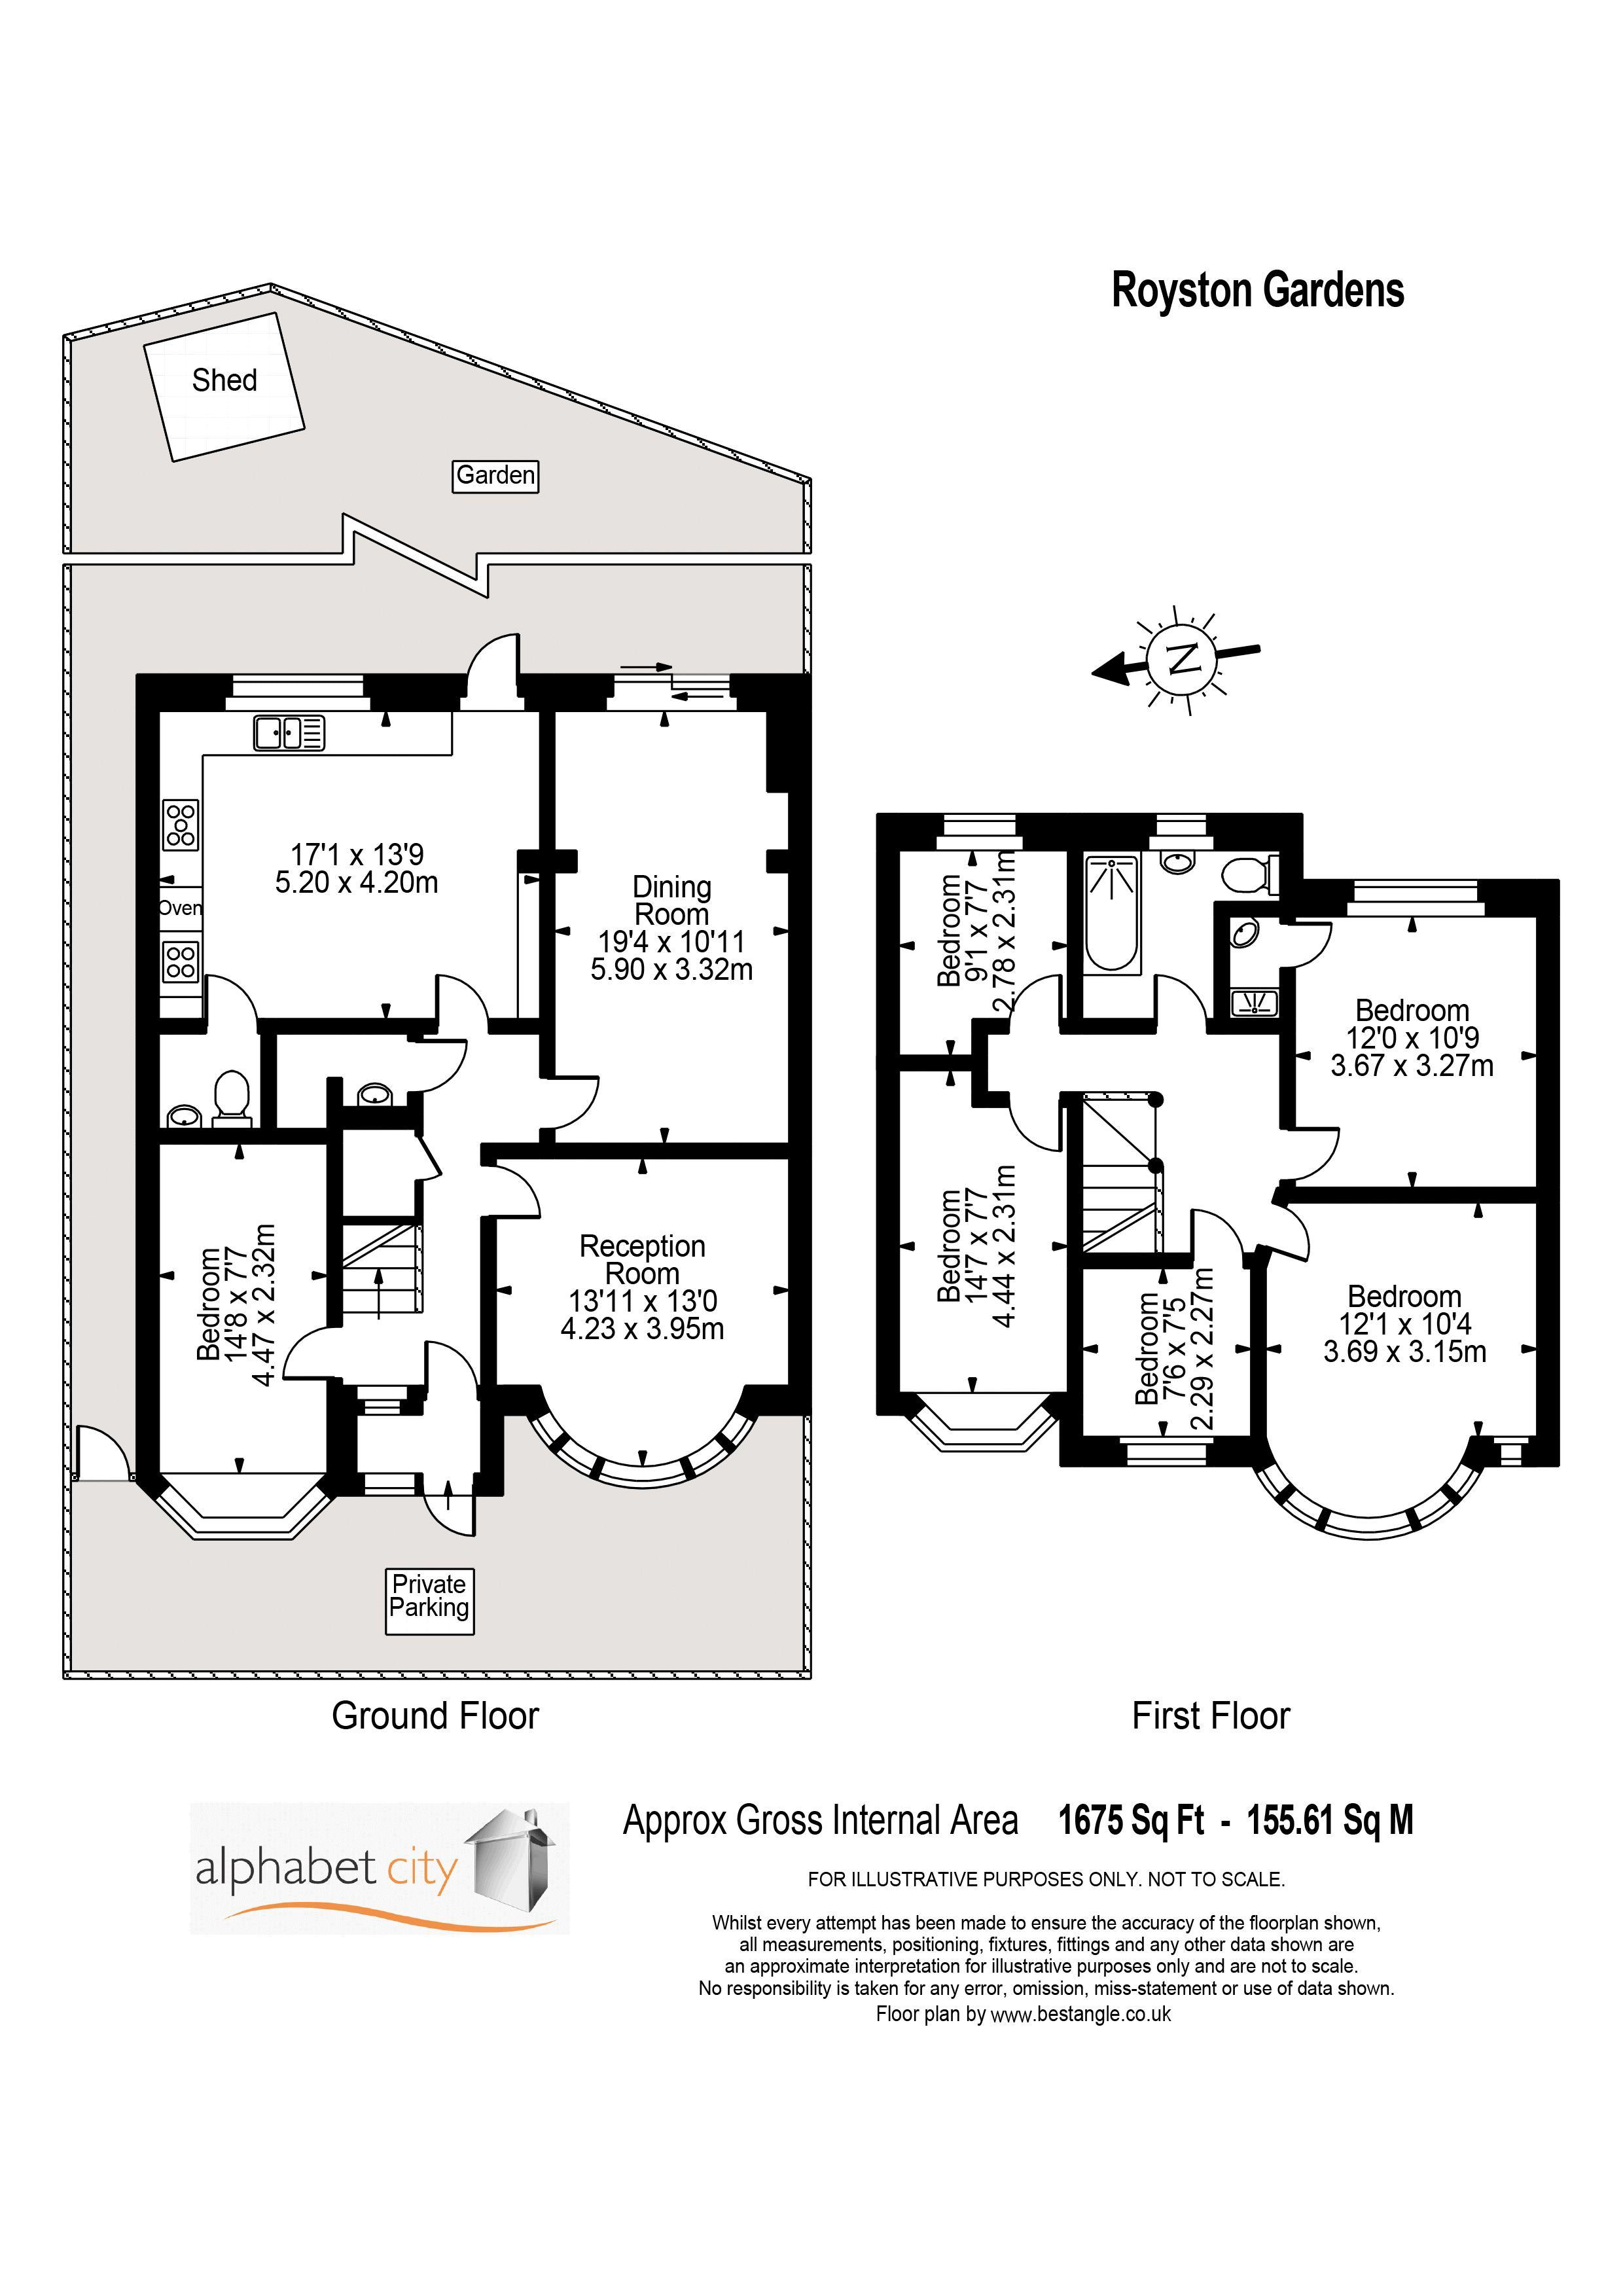 Floor Plan - Royston Gardens, IG1 3SX